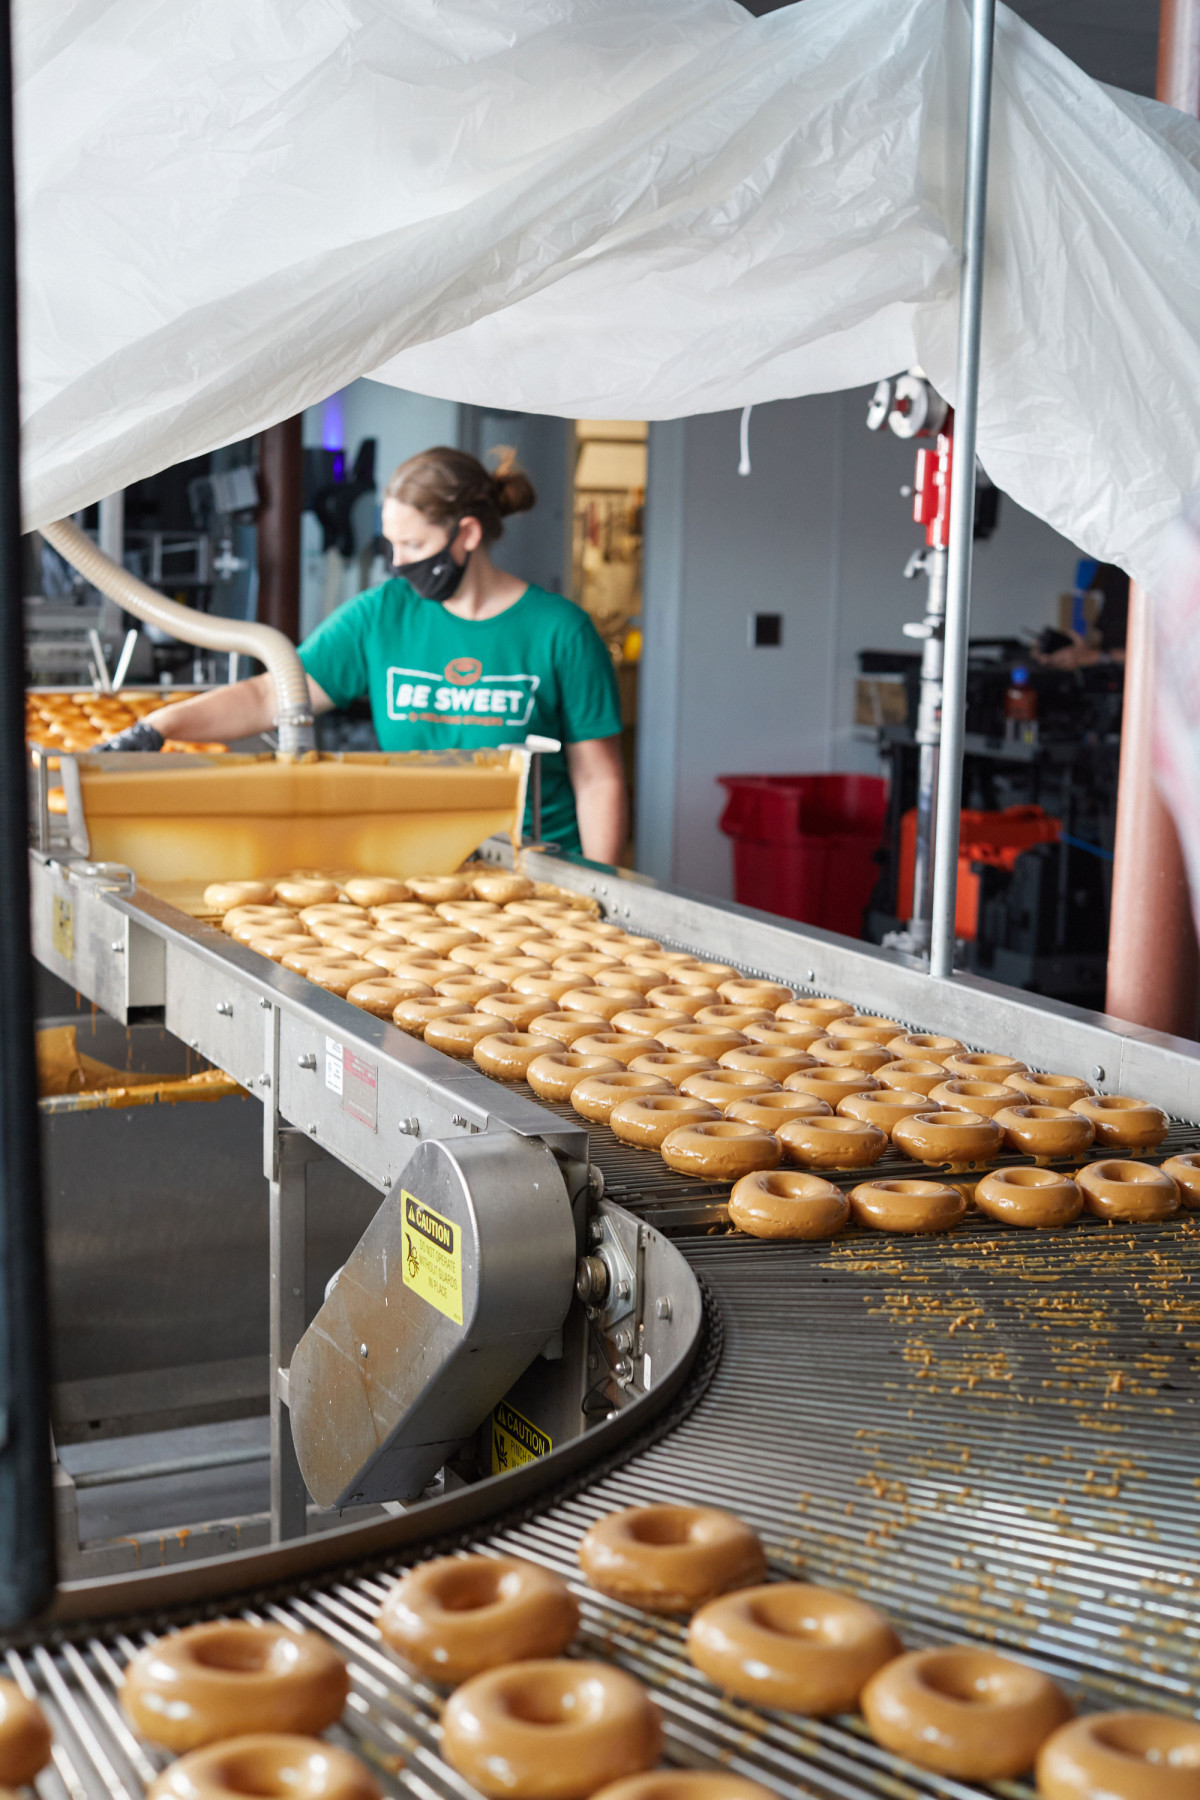 Doughnut glazing production line at Krispy Kreme Doughnuts